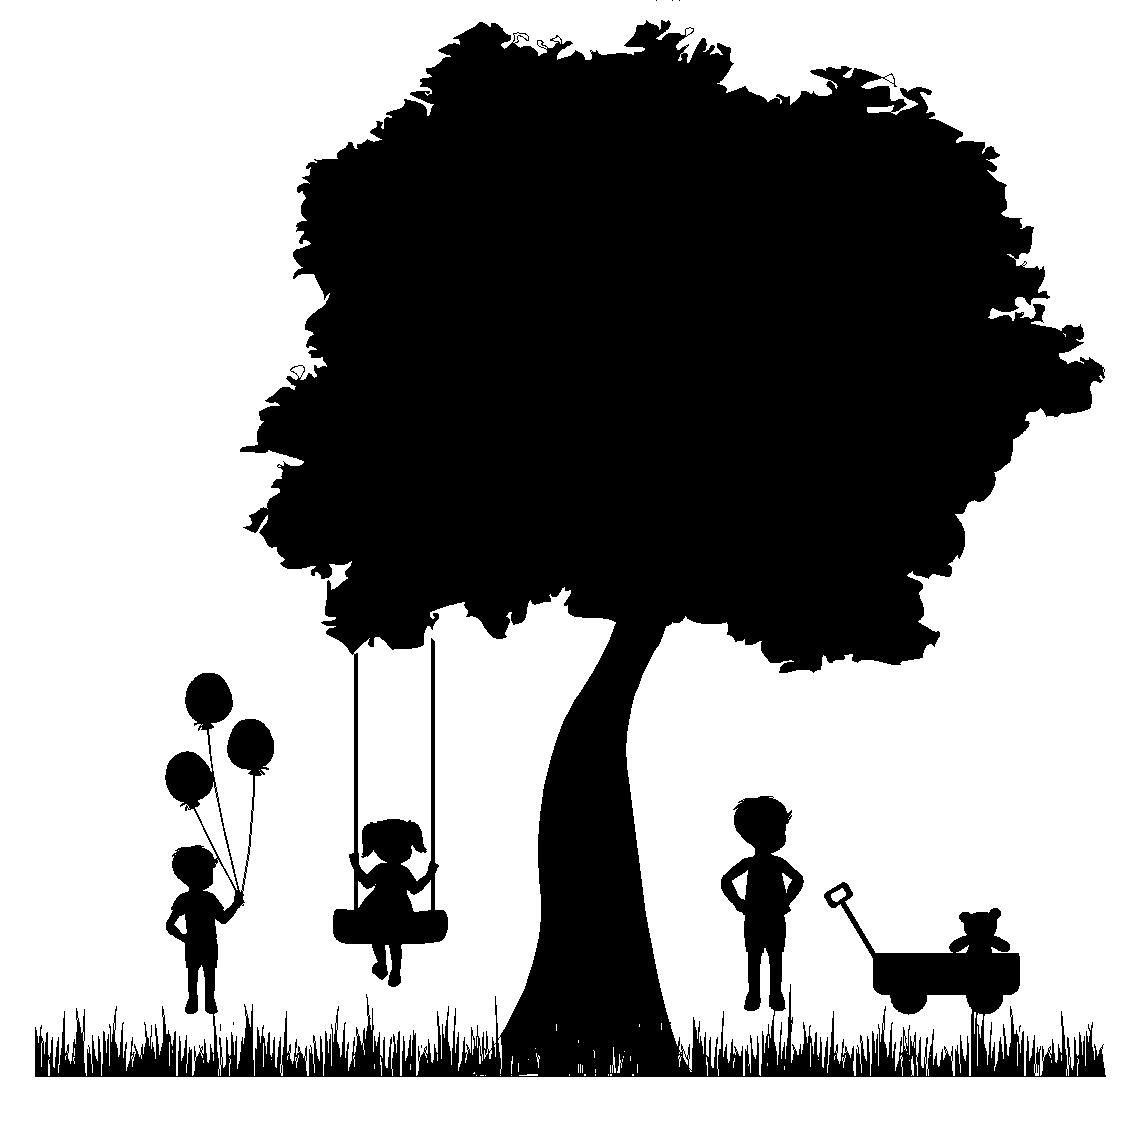 A Child\'s Garden silhouette 24 x 24.